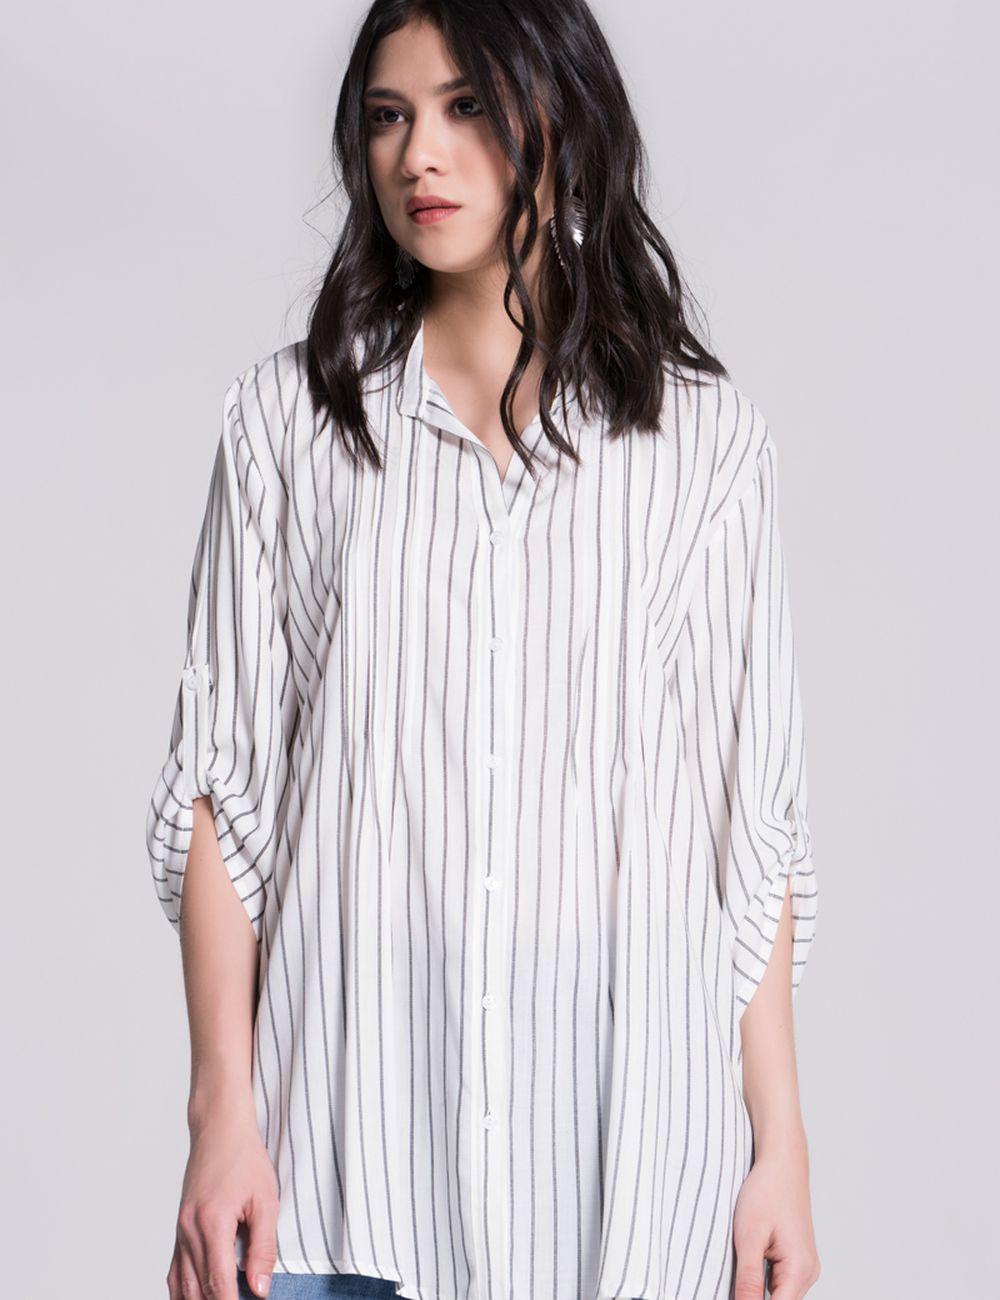 378f7af73 Blusas - Spírito Tienda online - Moda femenina